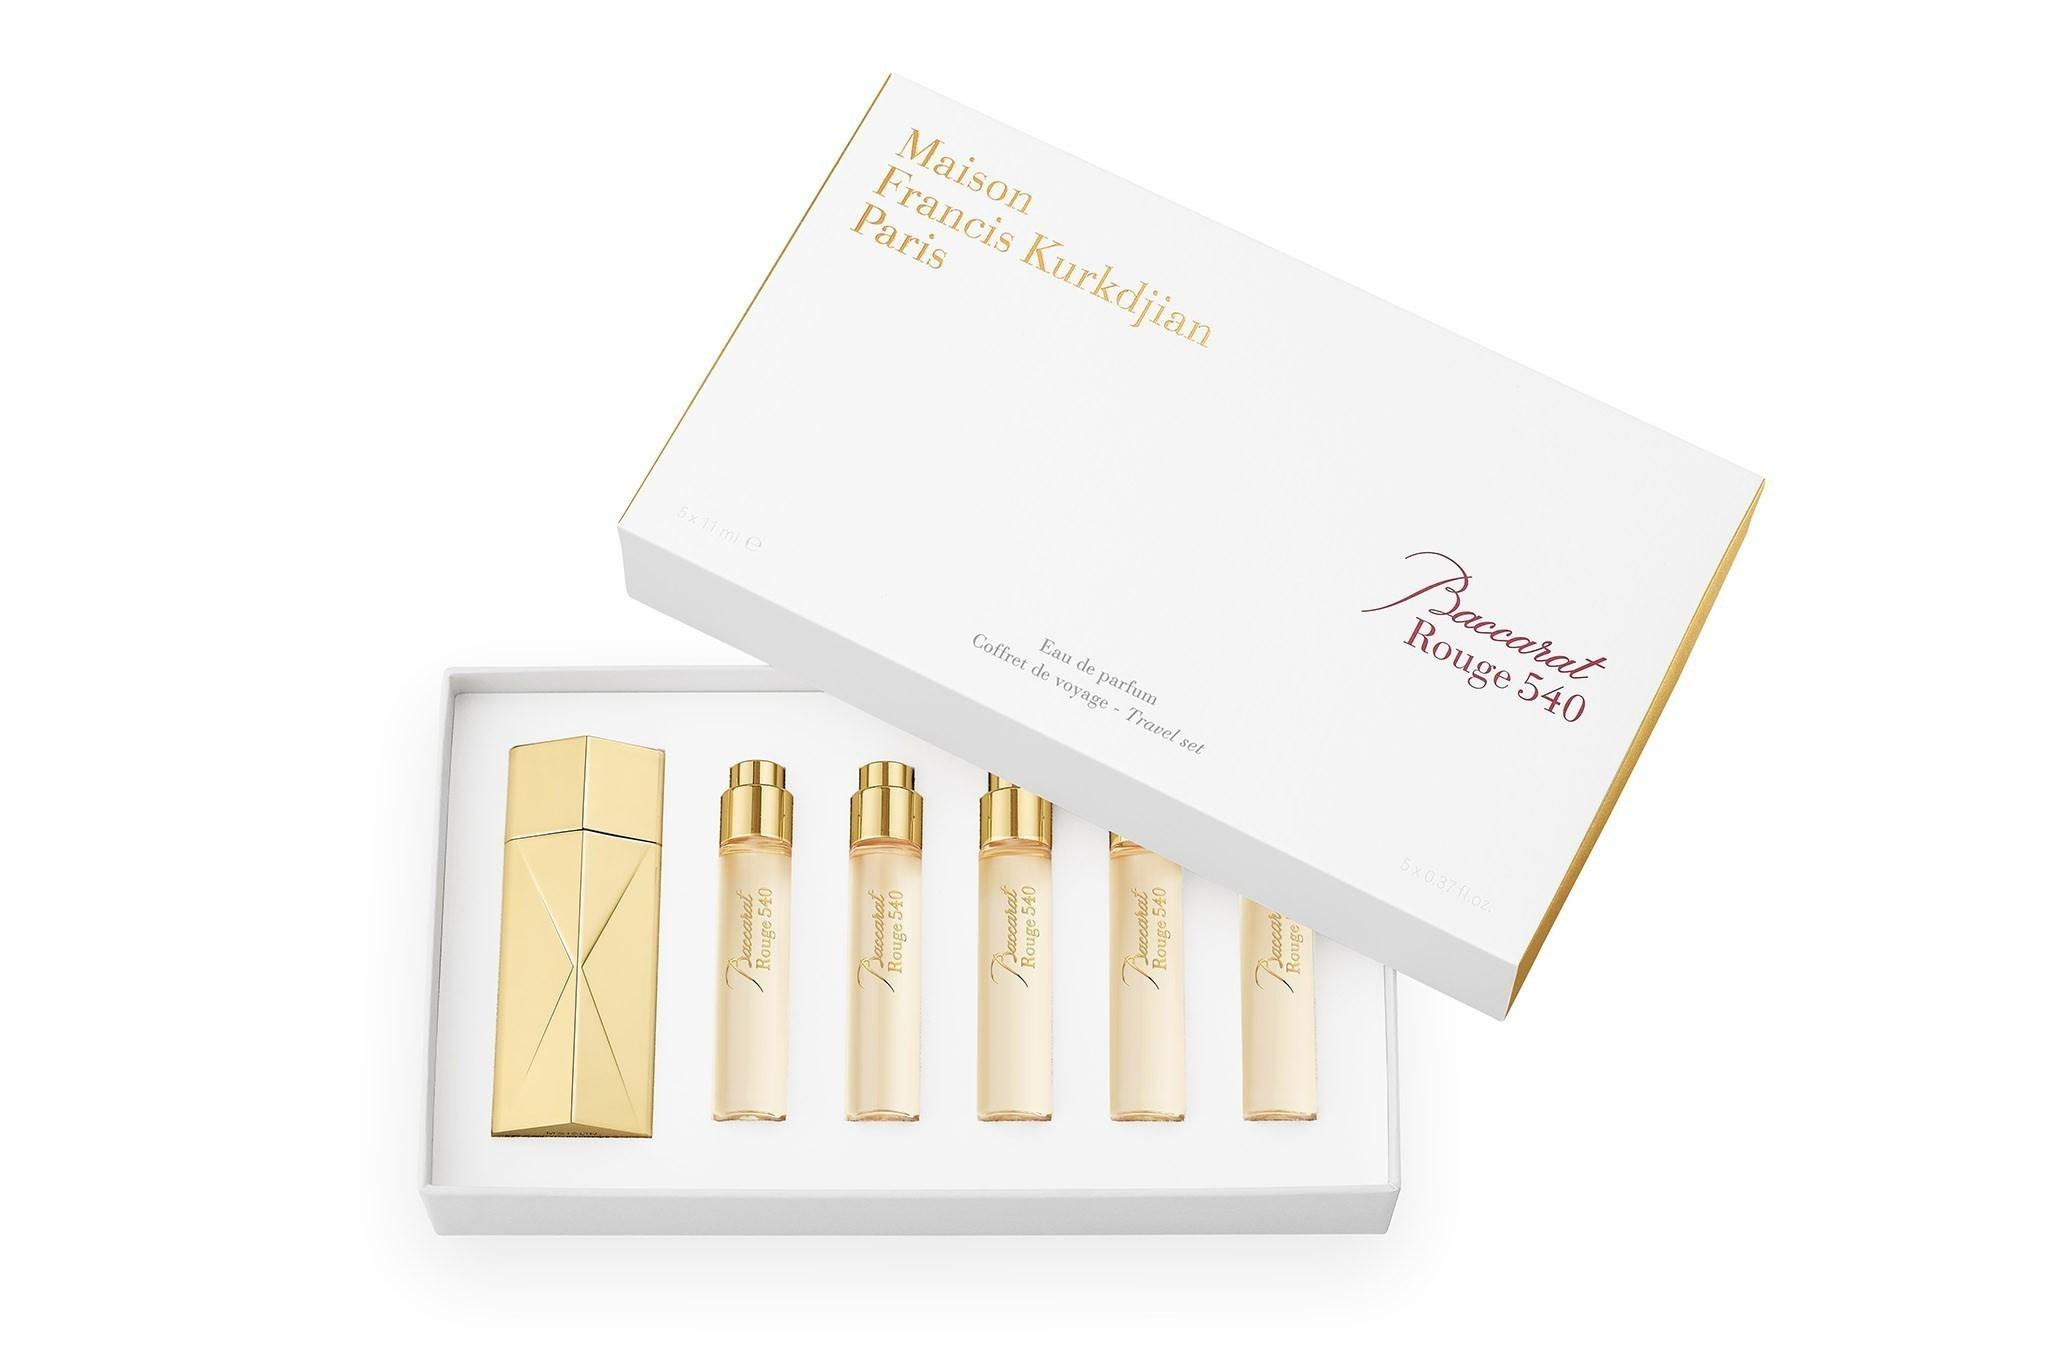 Lvmh acquires maison francis kurkdjian fragrance brand for Maison brand